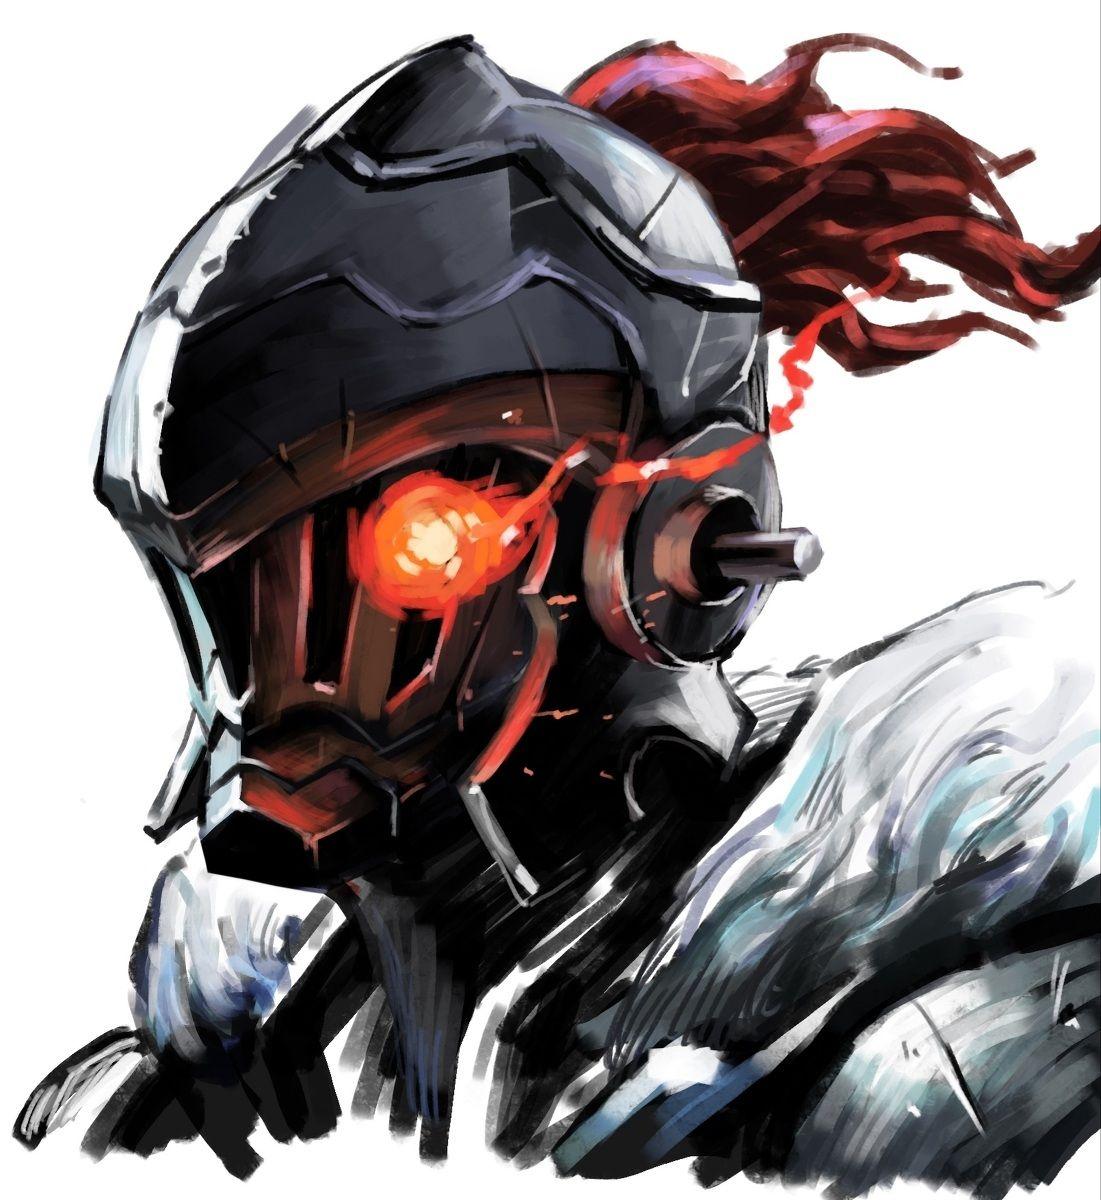 Animegame goblin slayer character goblin slayer pixivs